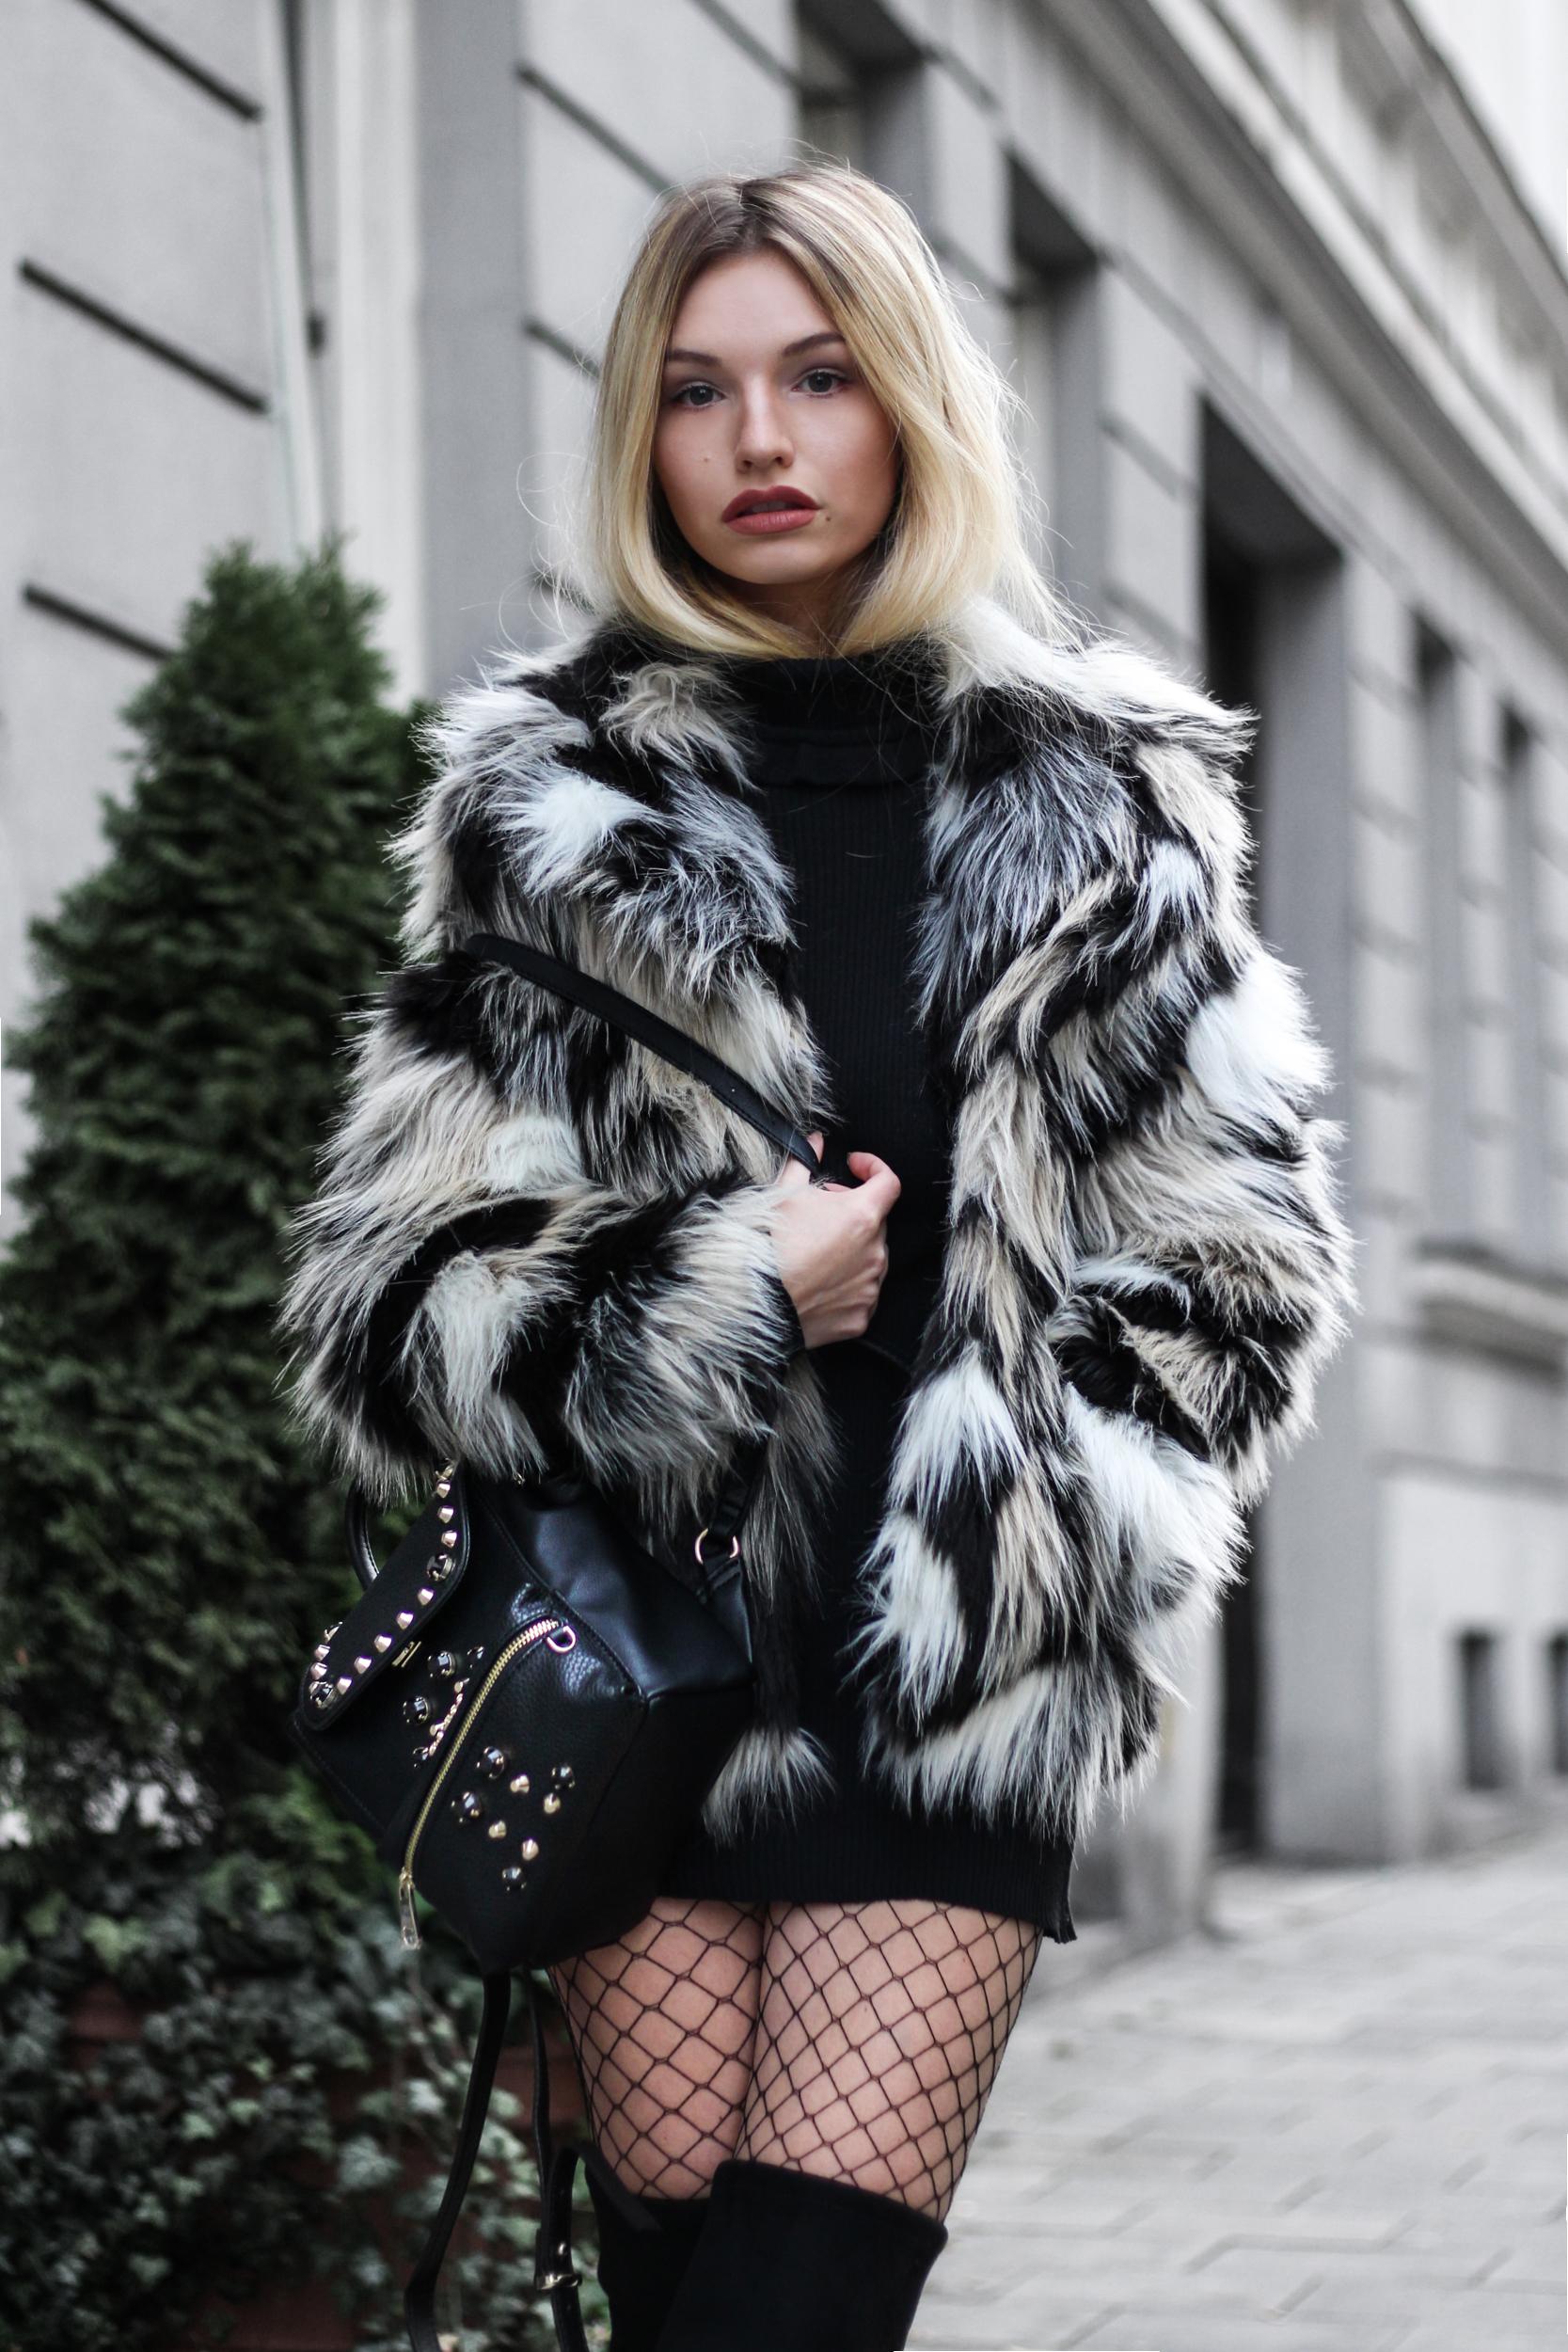 franziska-elea-blogger-aus-muenchen-fake-fur-jacke-netzstrumpfhose-overknee-stiefel-guess-rucksack-felljacke-winter-look-style-fashionblogger_